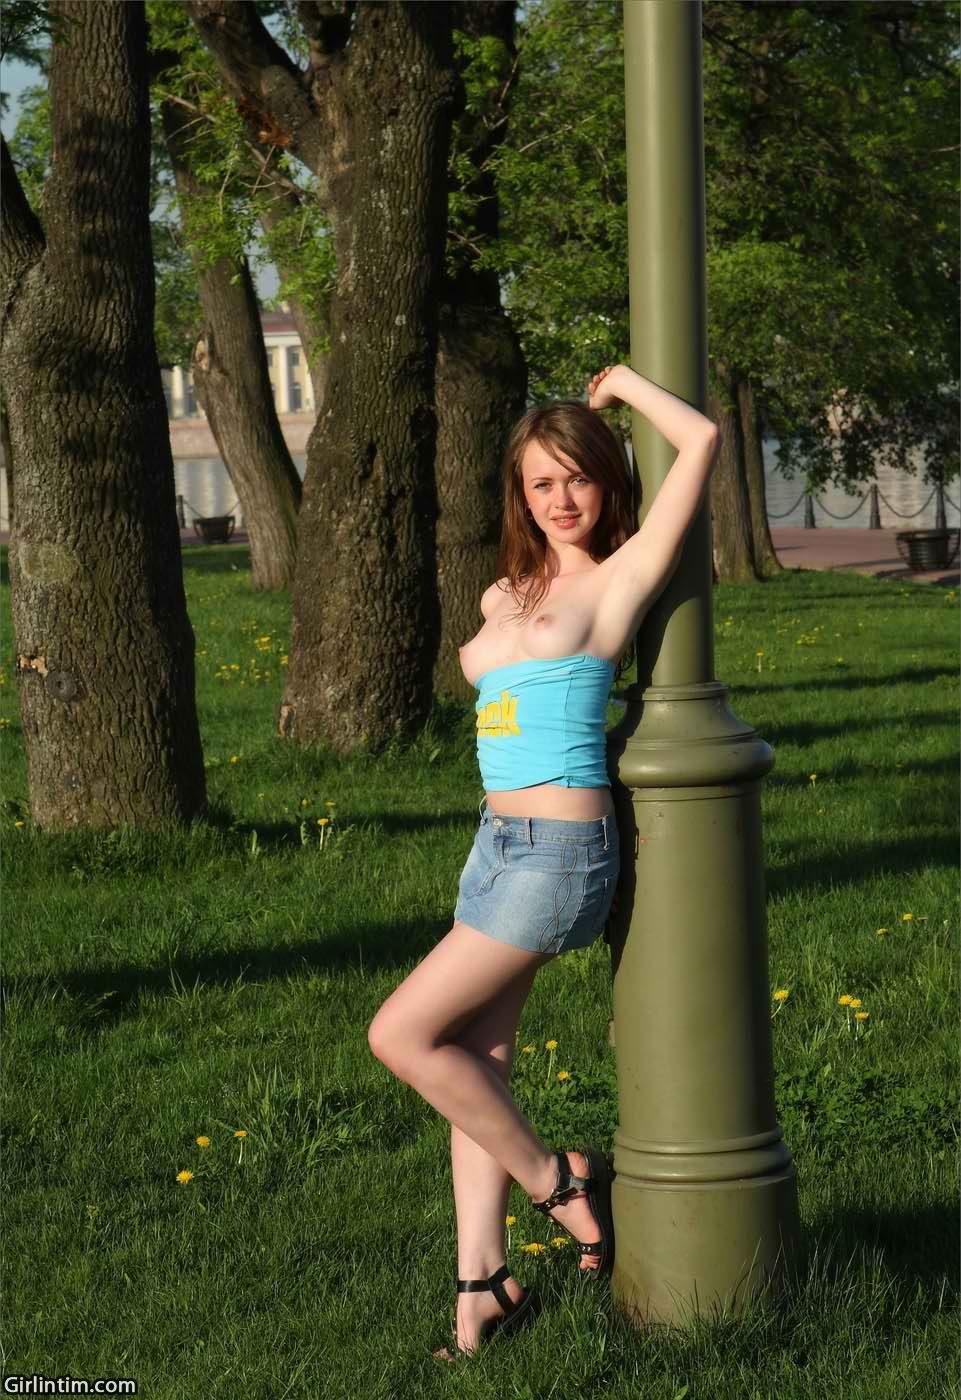 Санкт петербург девушки и ждёт на сексими 19 фотография